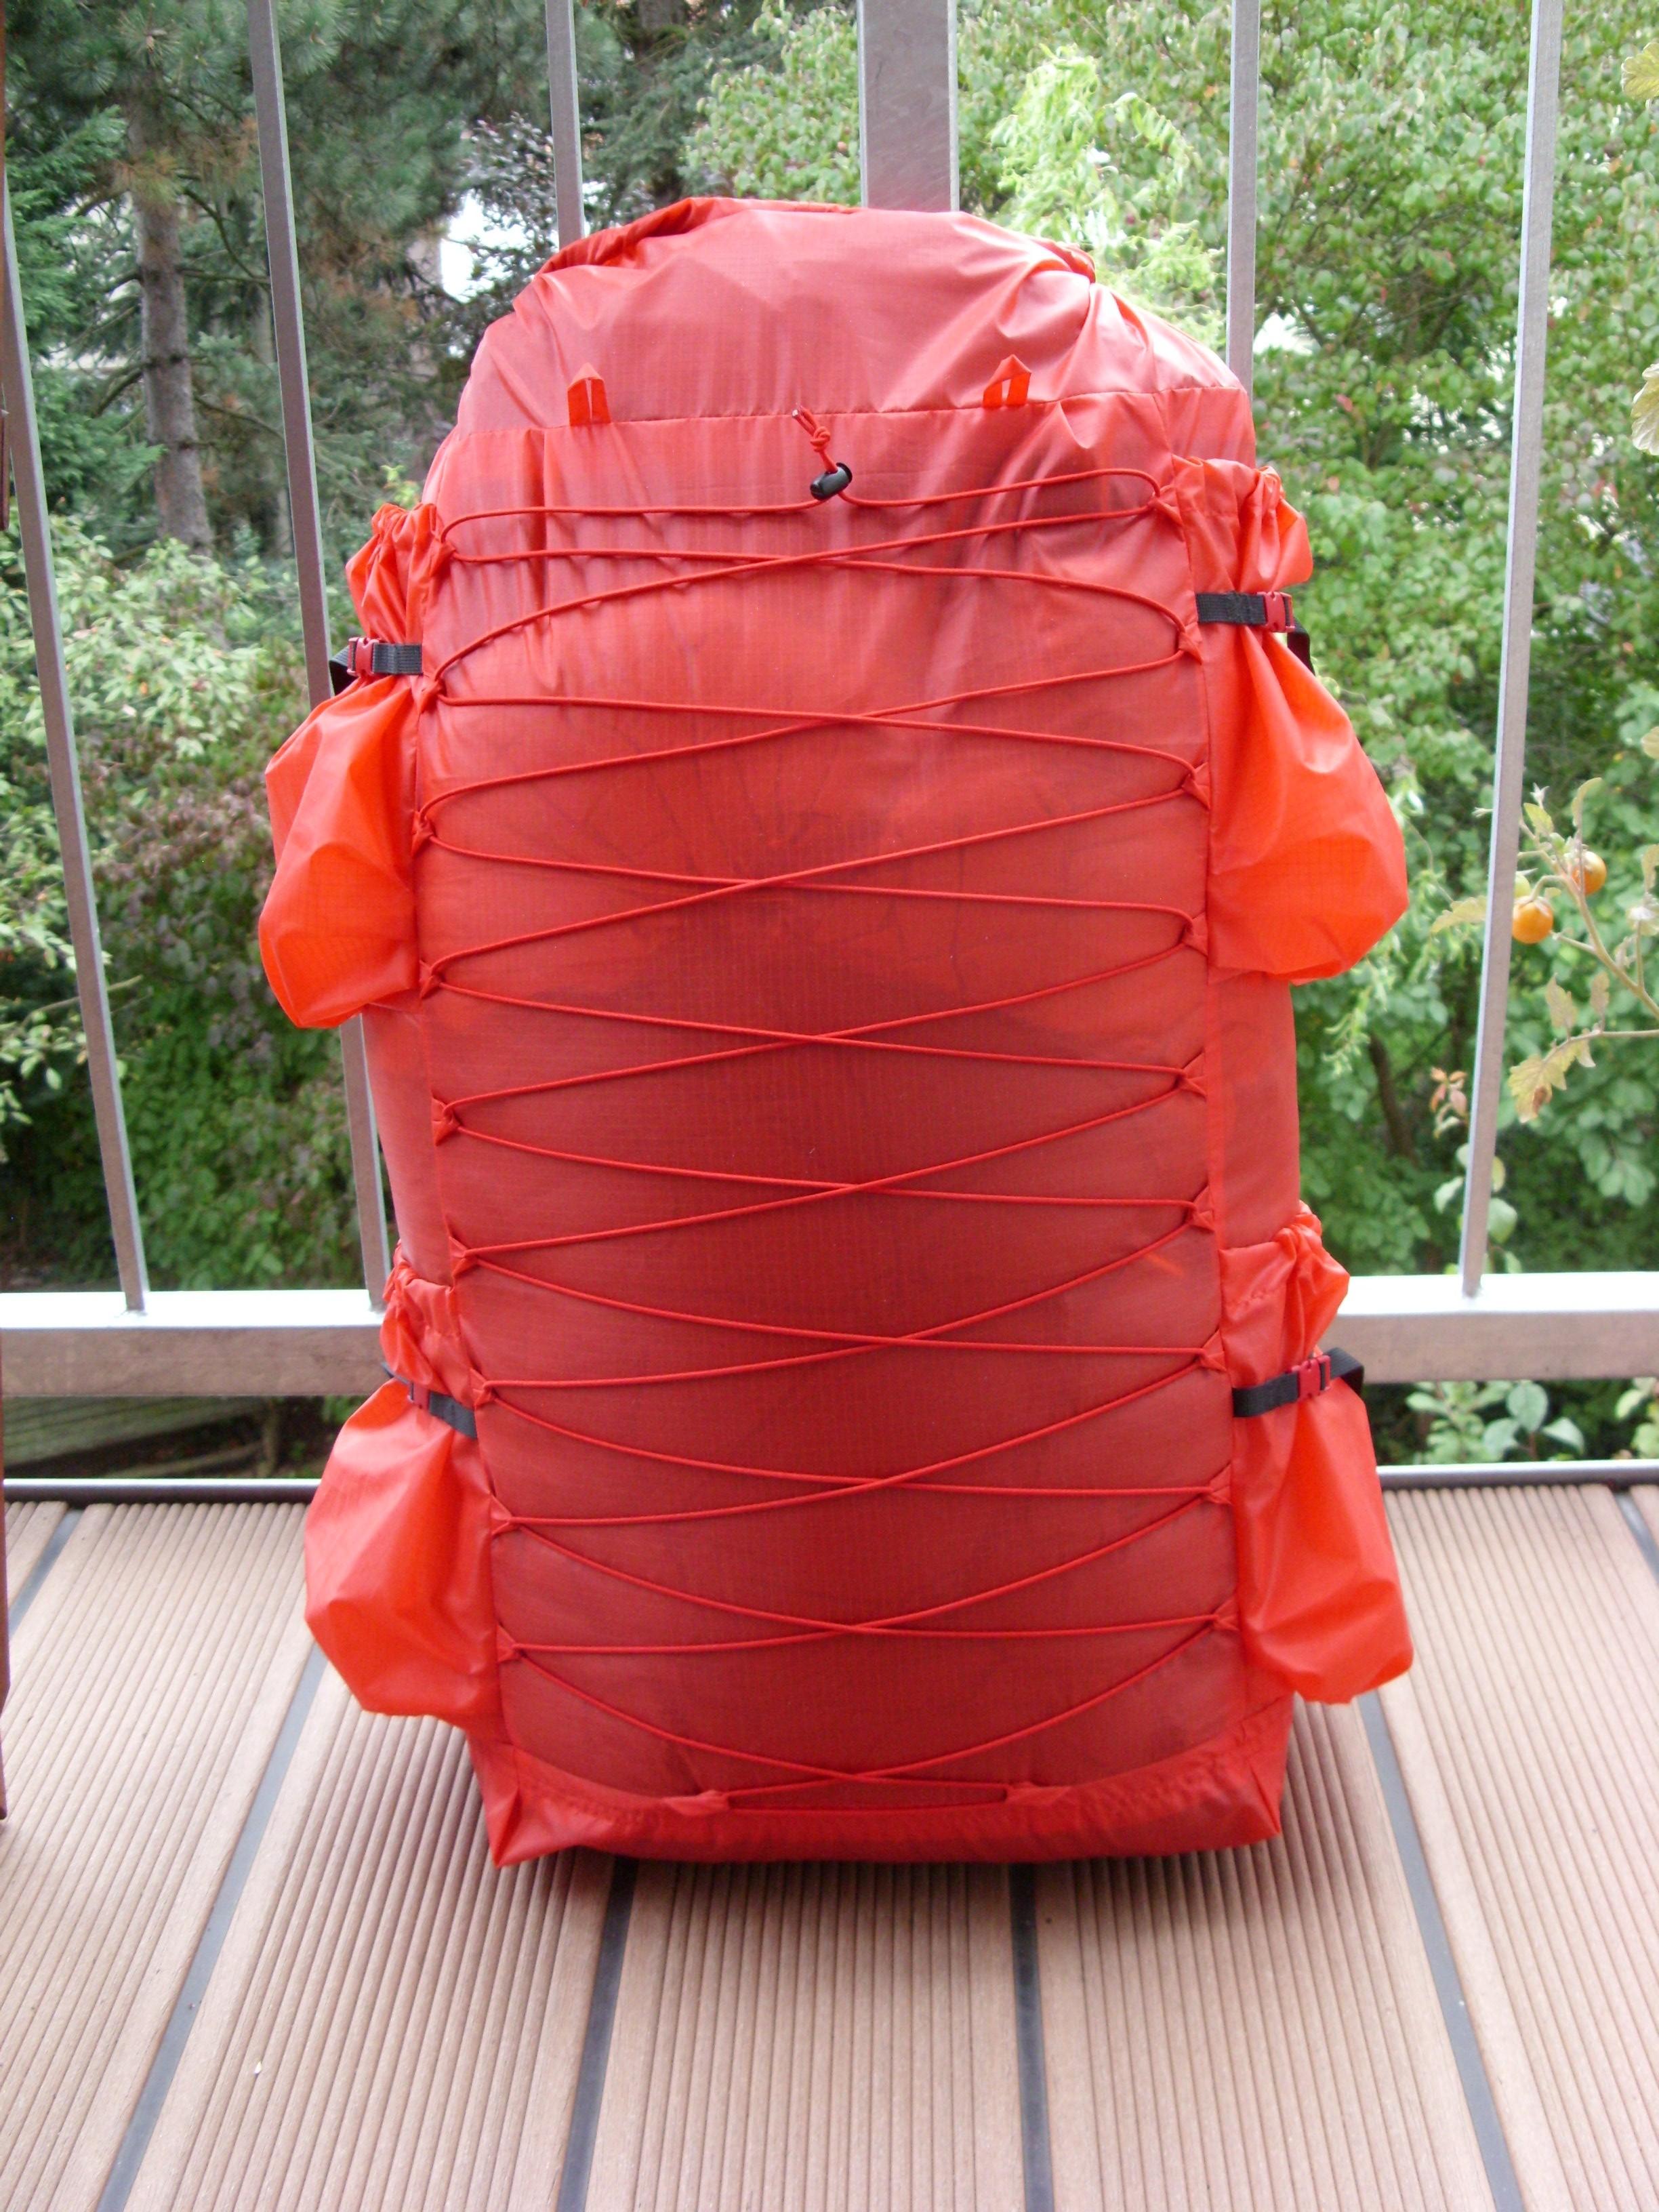 Diy Backpack 50l Volume, 65g/qm Silnylon, 200g Weight ...